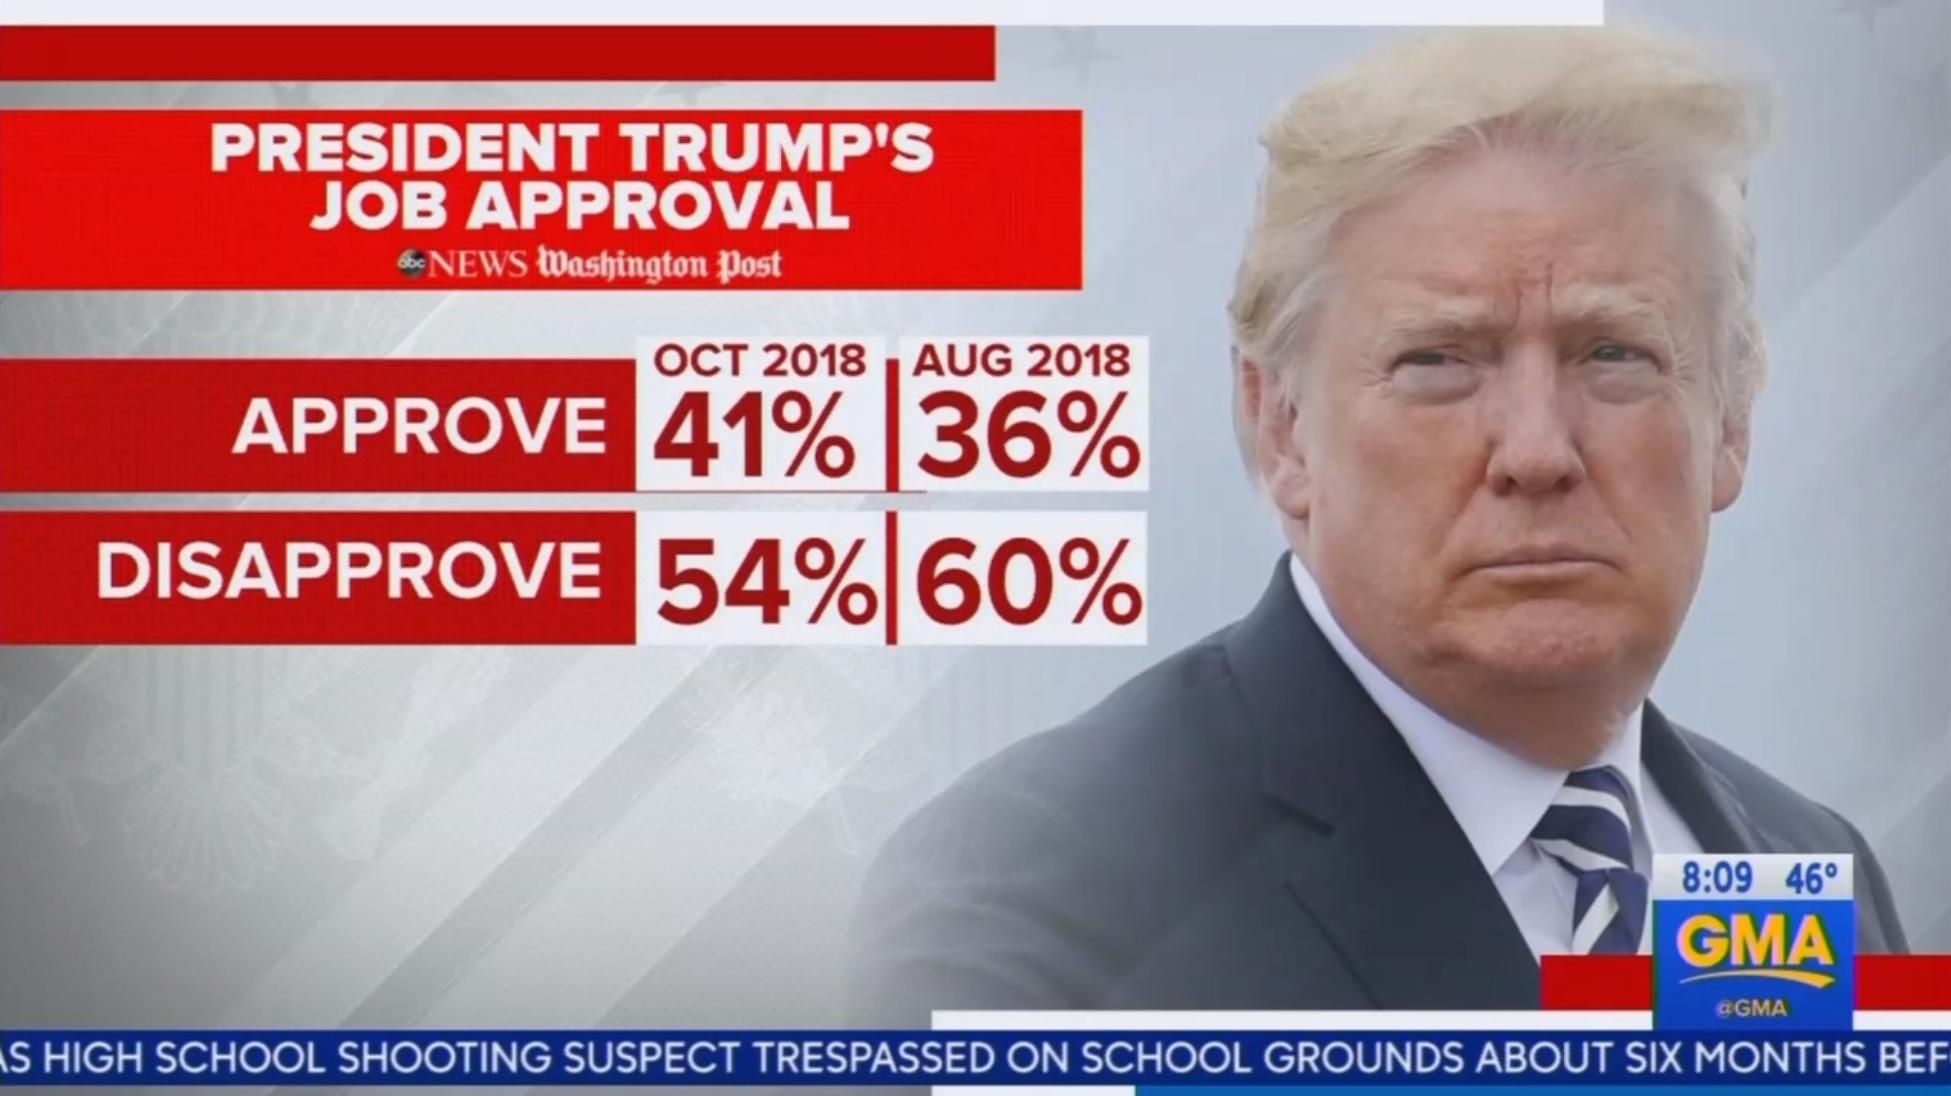 ABC Dismisses Uptick in President Trump's Approval Rating Before Nov.